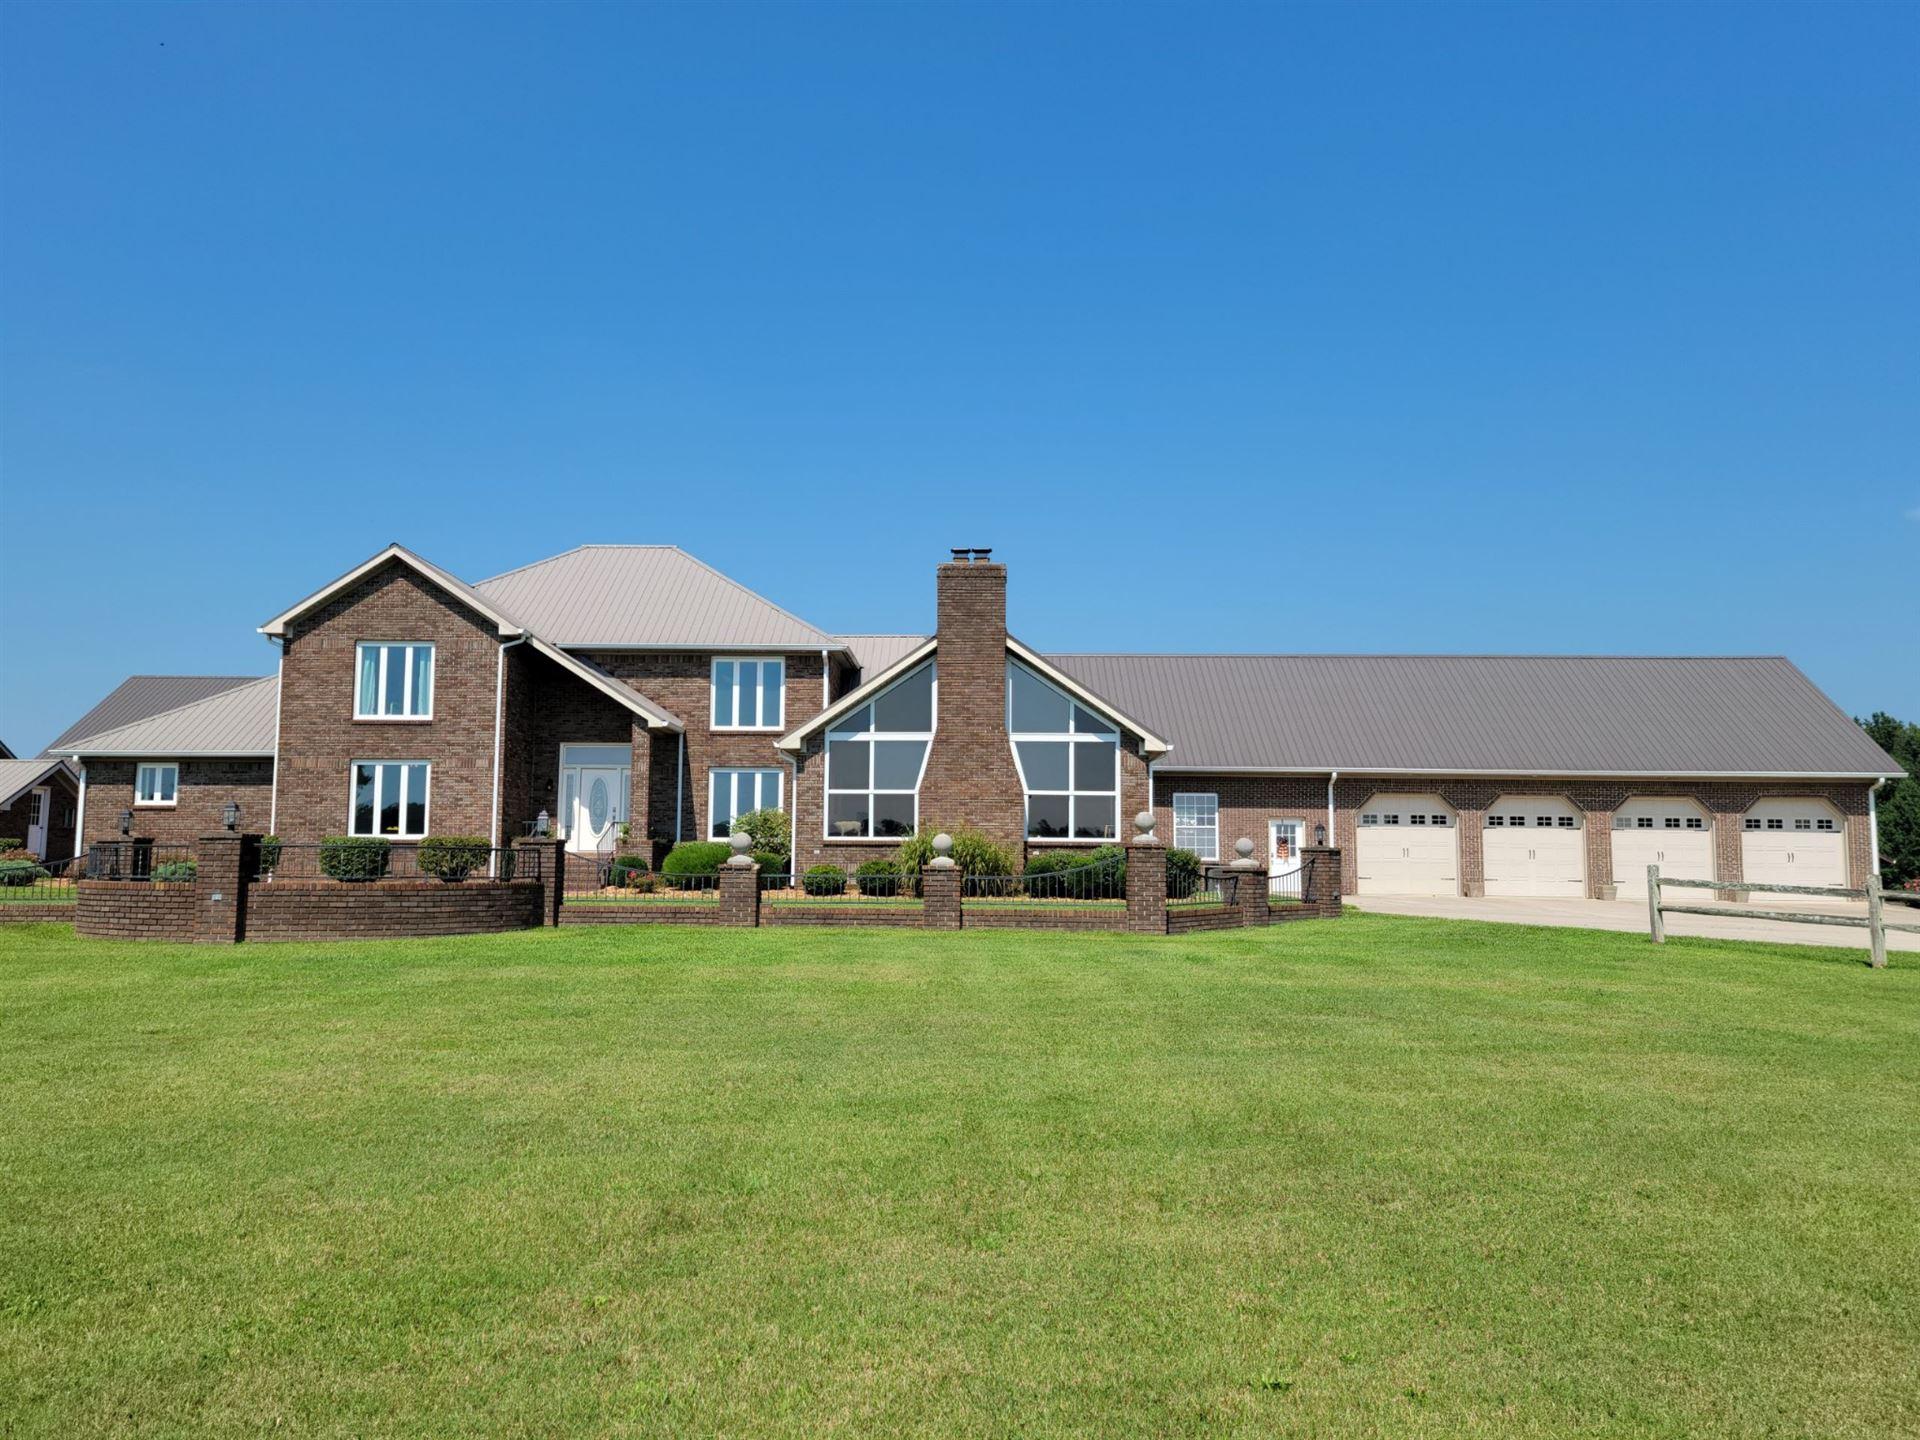 6223 Short Mountain Rd, McMinnville, TN 37110 - MLS#: 2232337